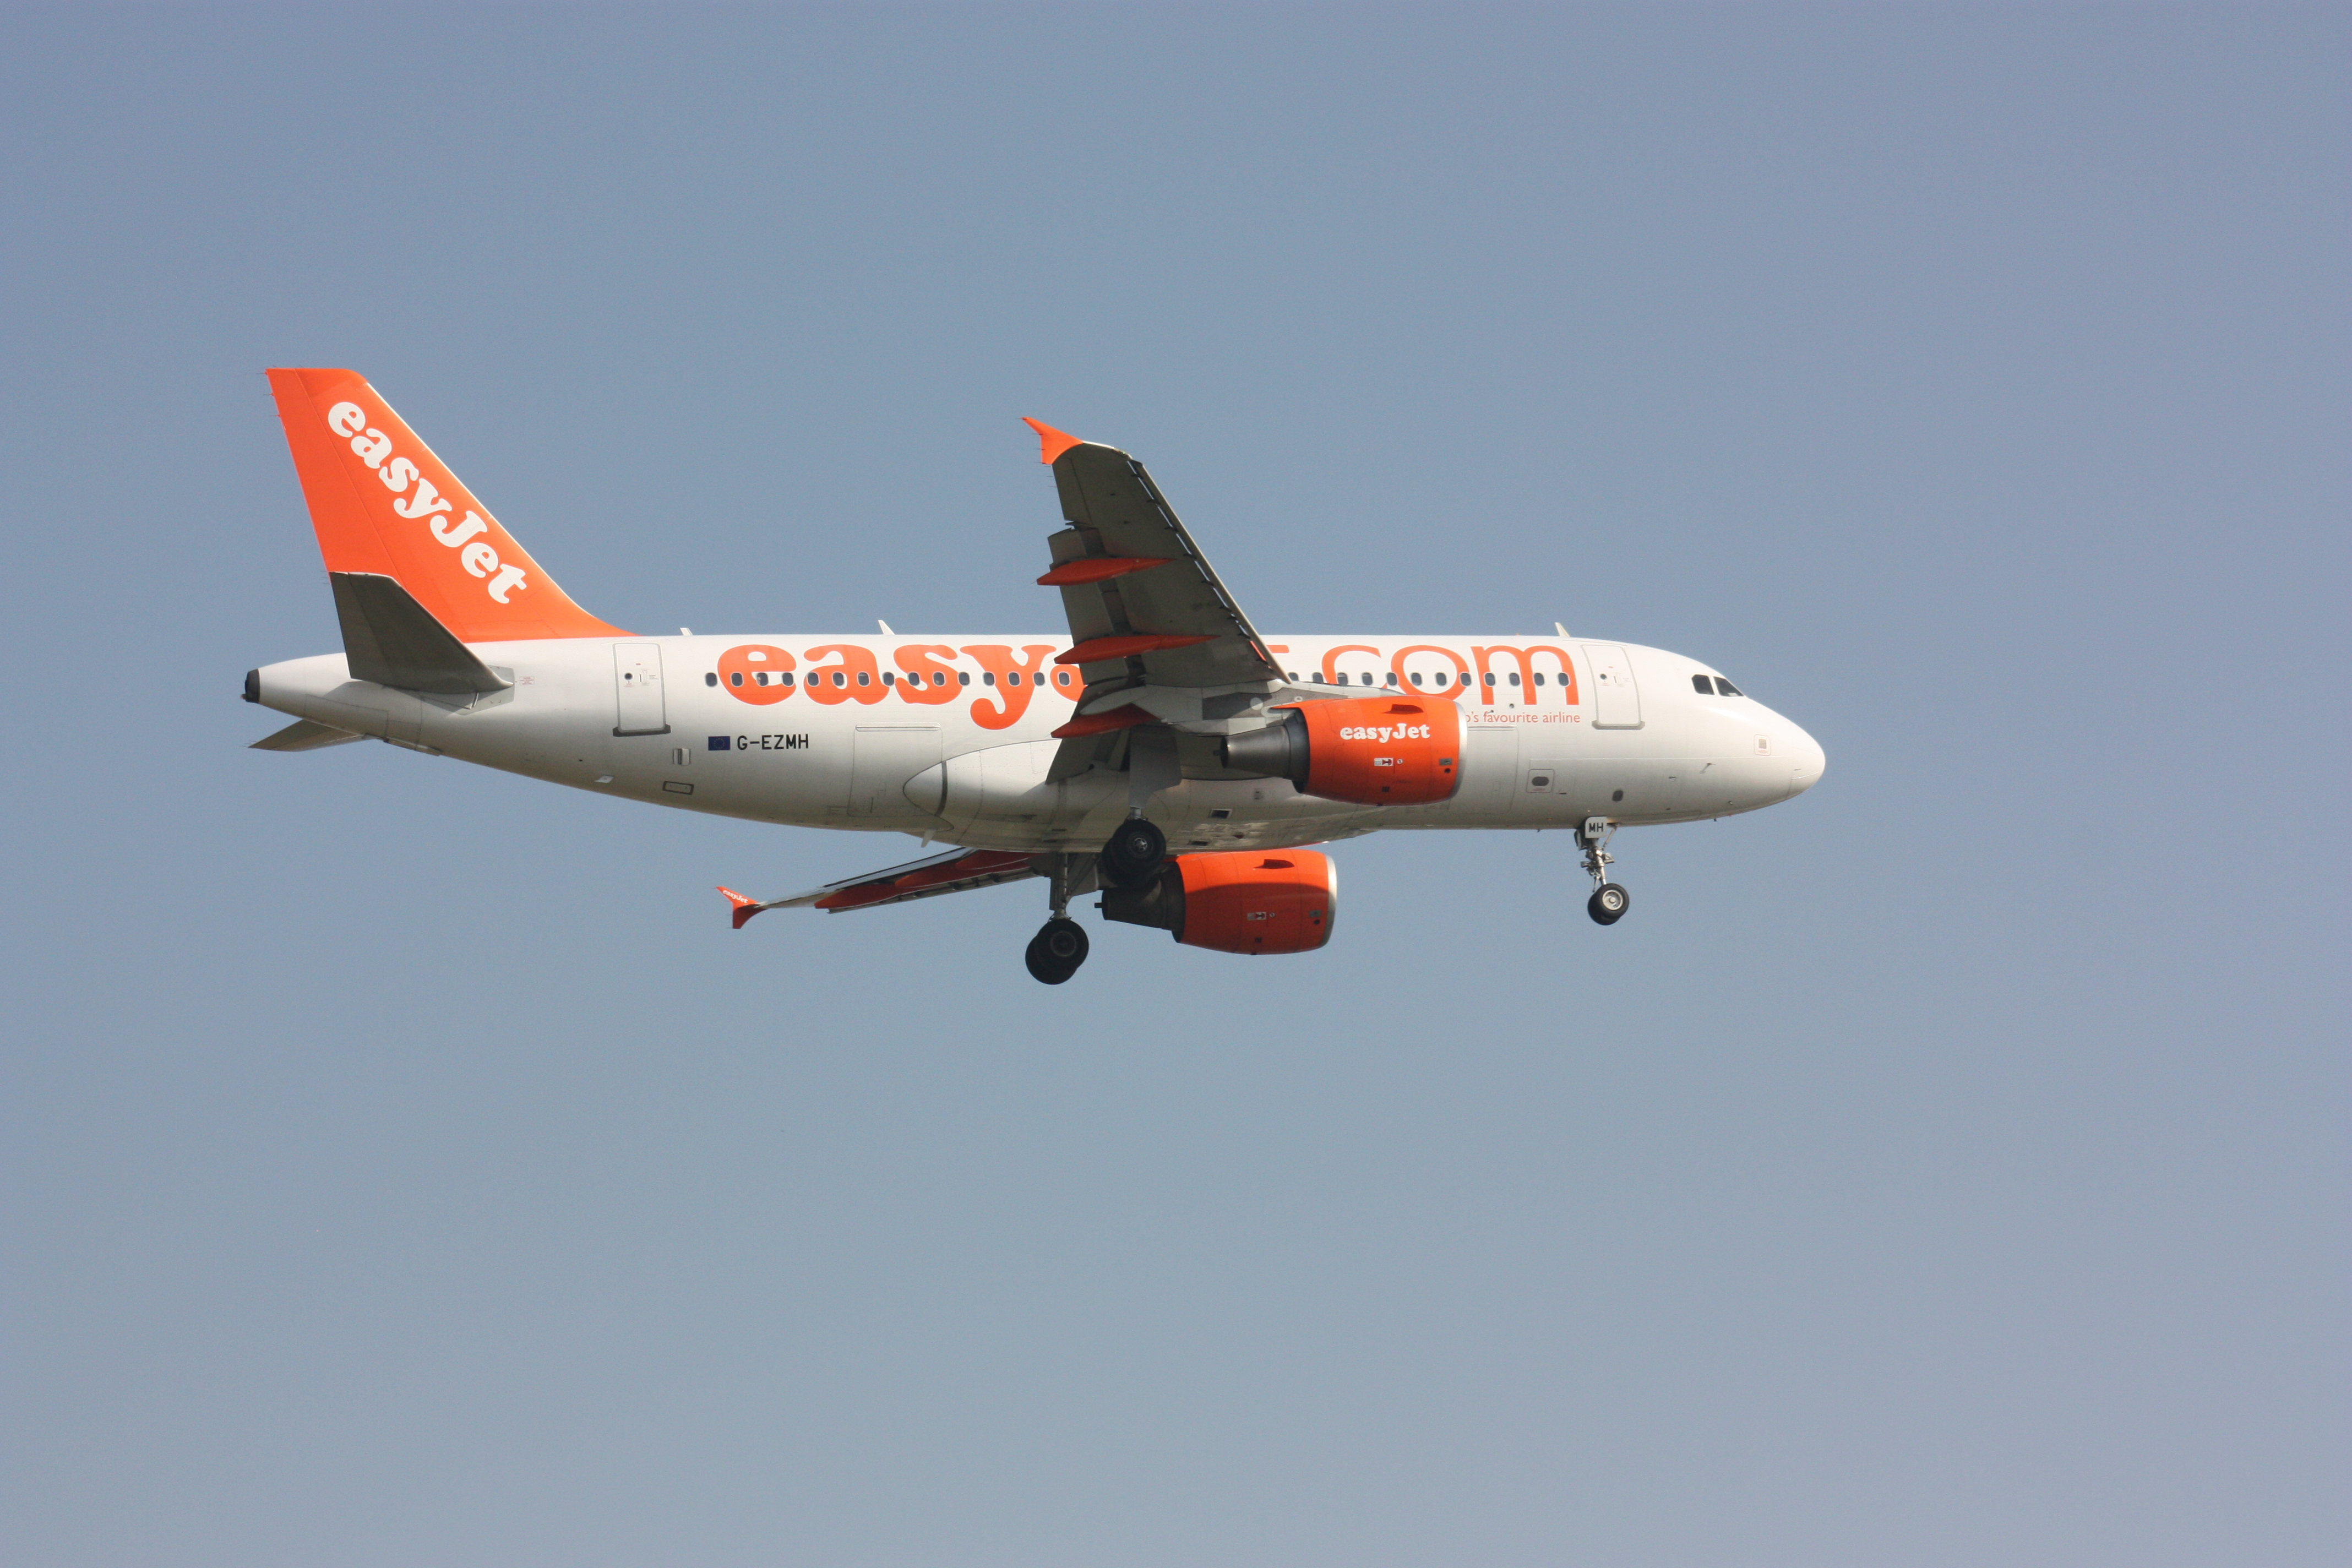 easyjet a319 - photo #40